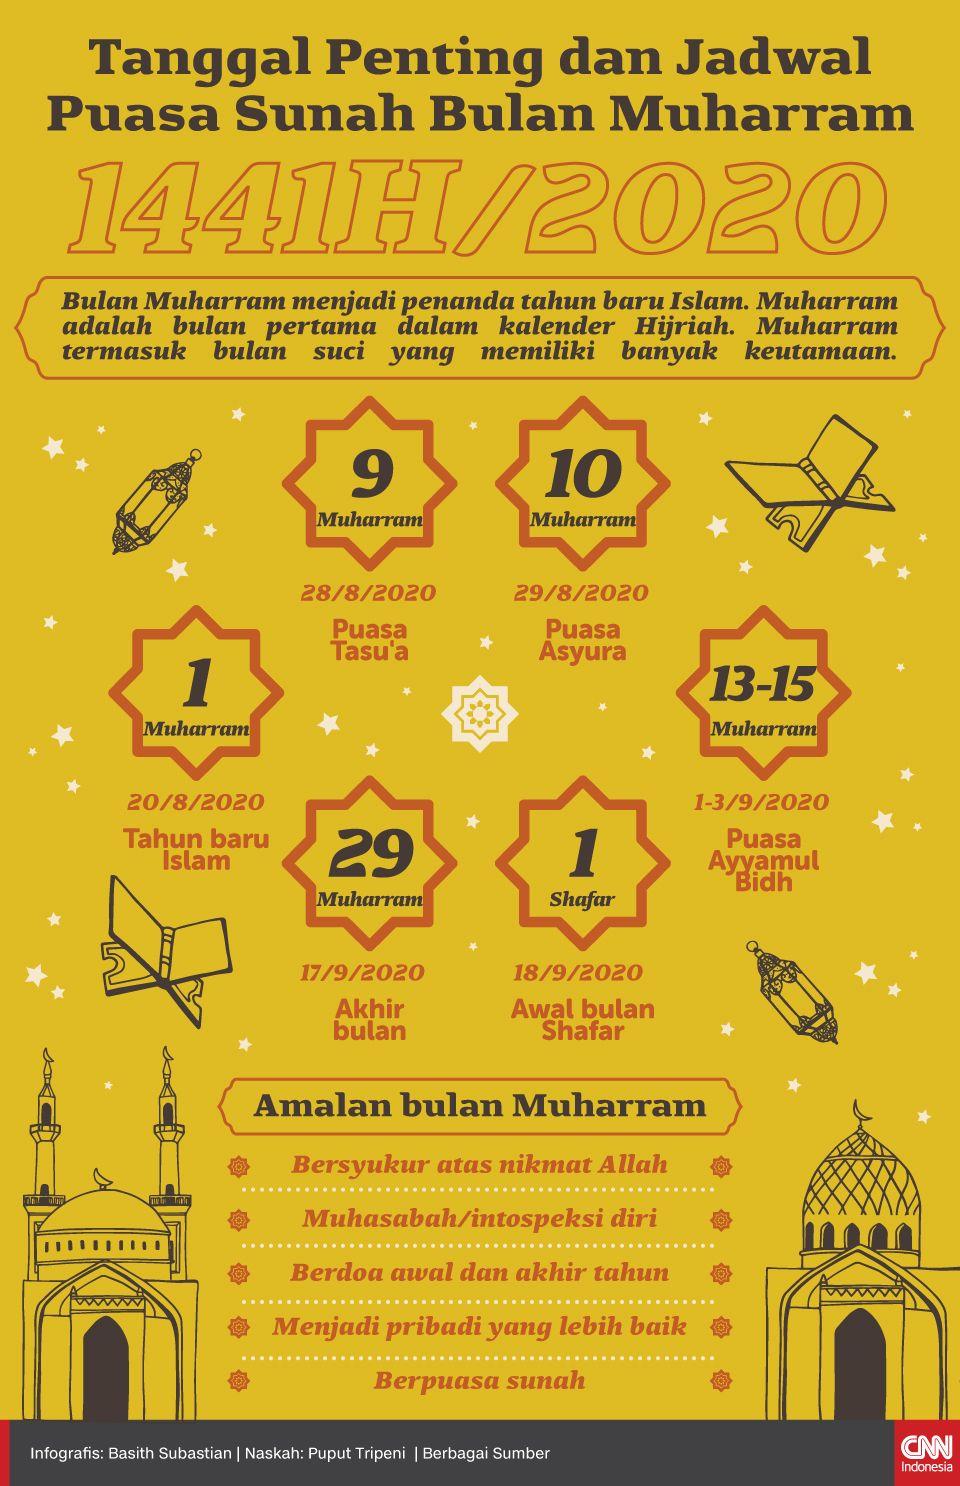 Tanggal Penting dan Jadwal Puasa Sunah Bulan Muharram di